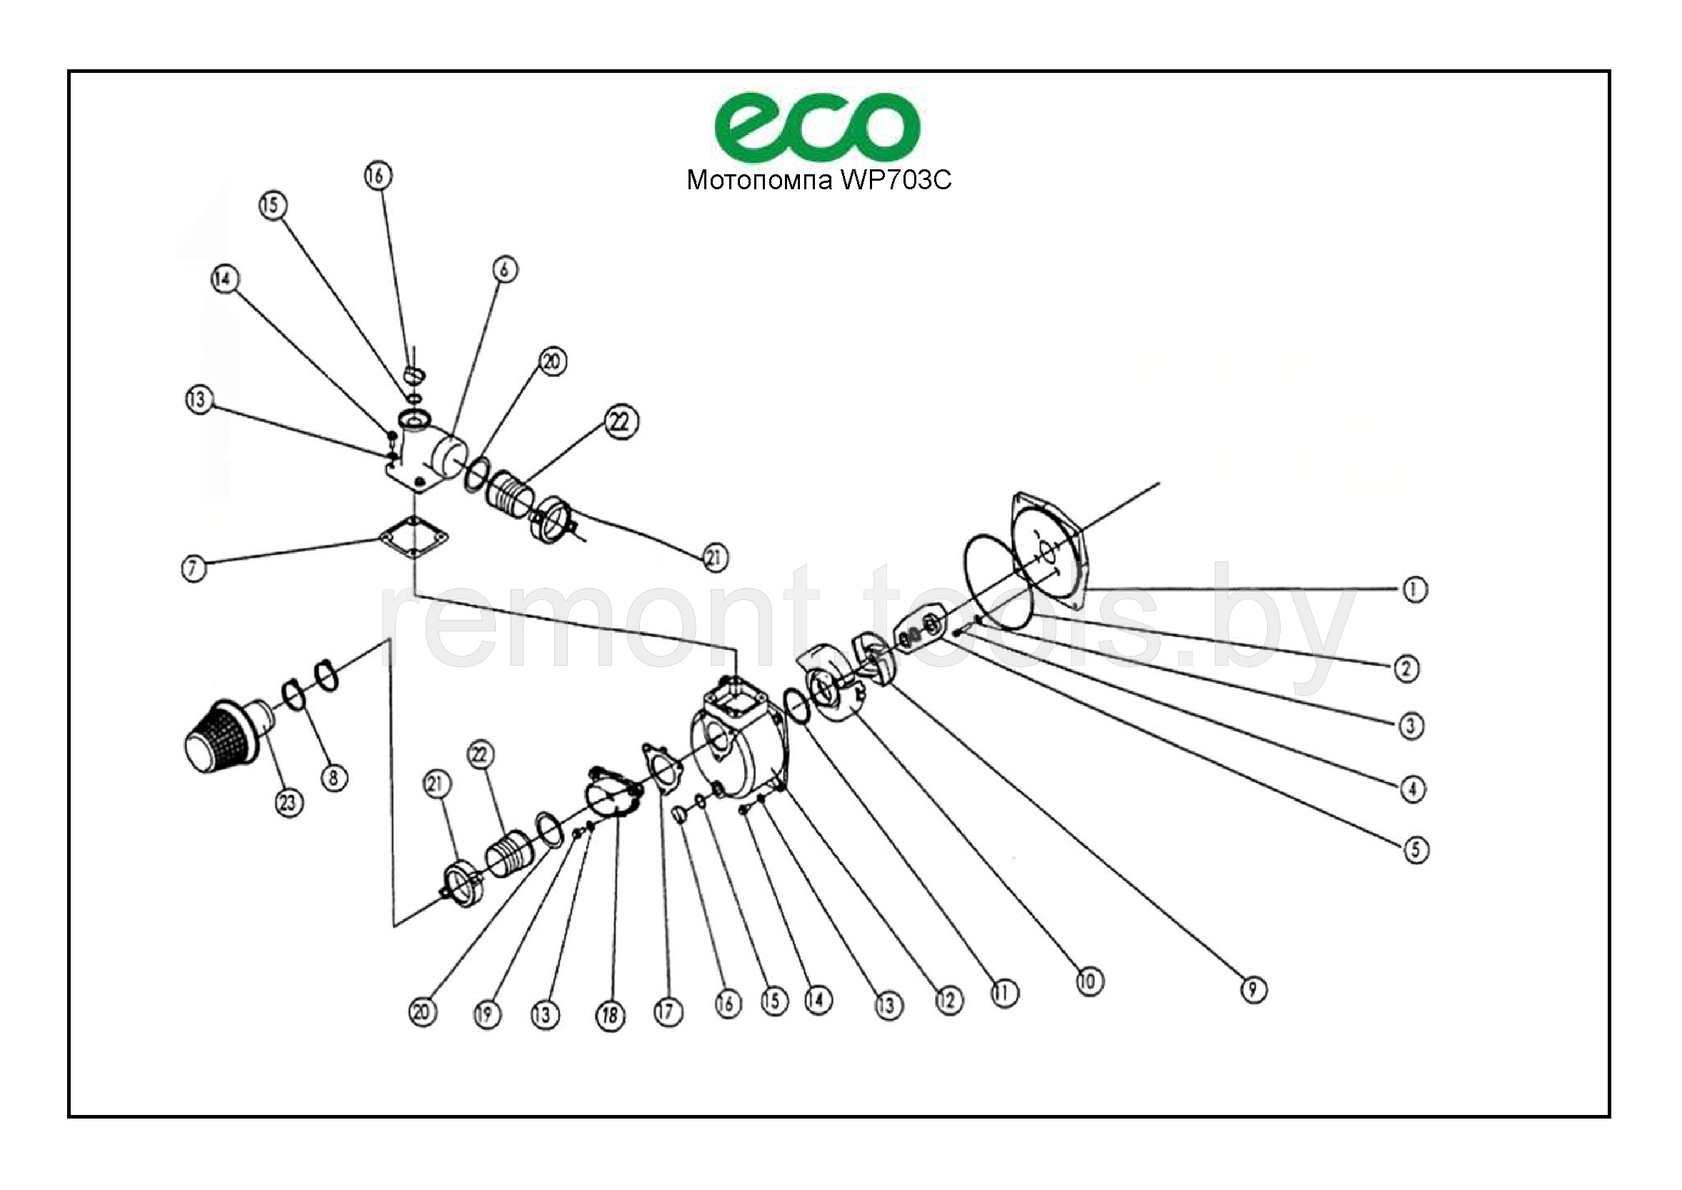 Eco Мотопомпа Wp703c